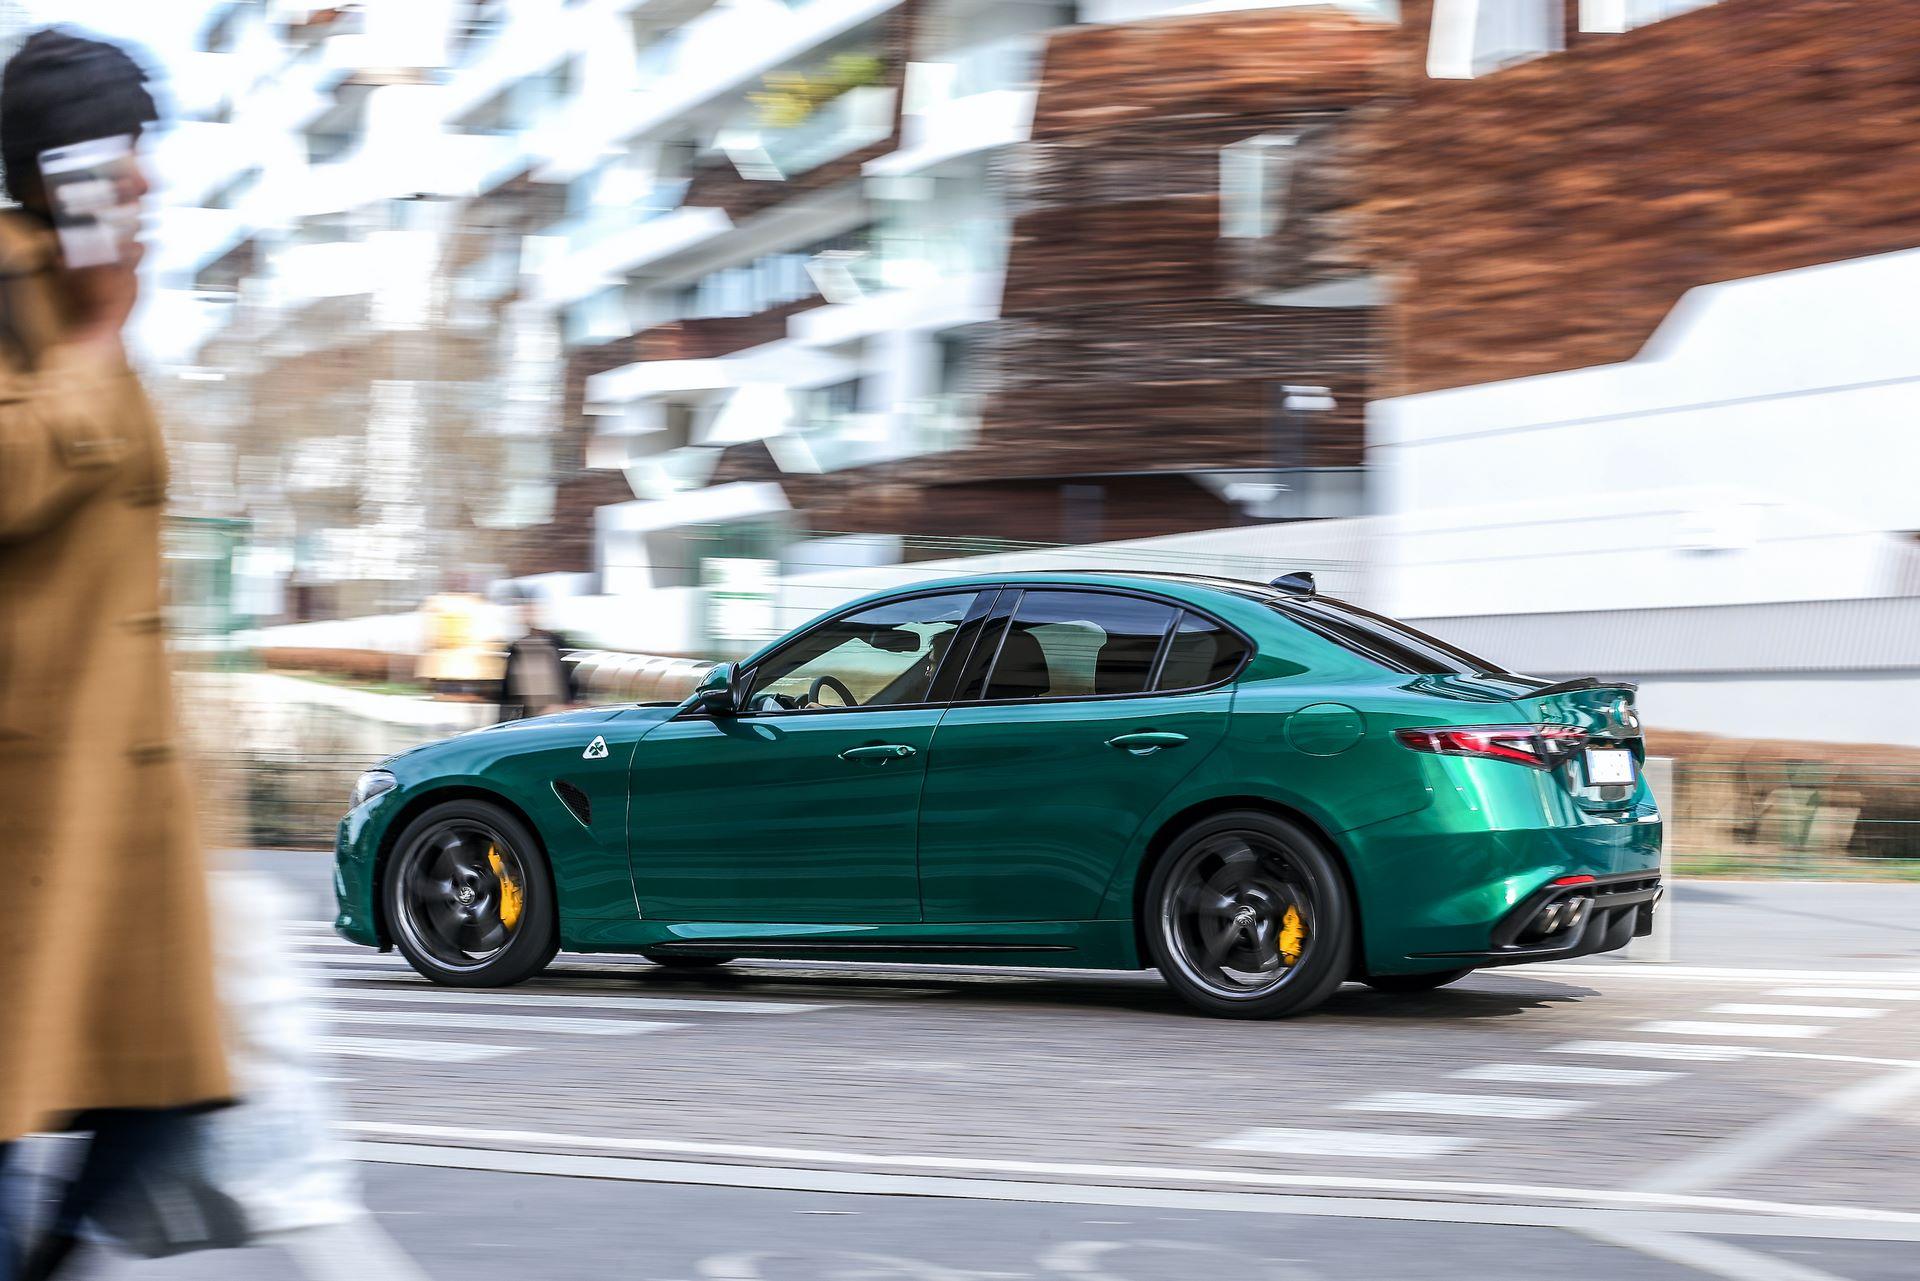 Alfa-Romeo-Giulia-Quadrifoglio-Stelvio-Quadrifoglio-facelift-2020-16